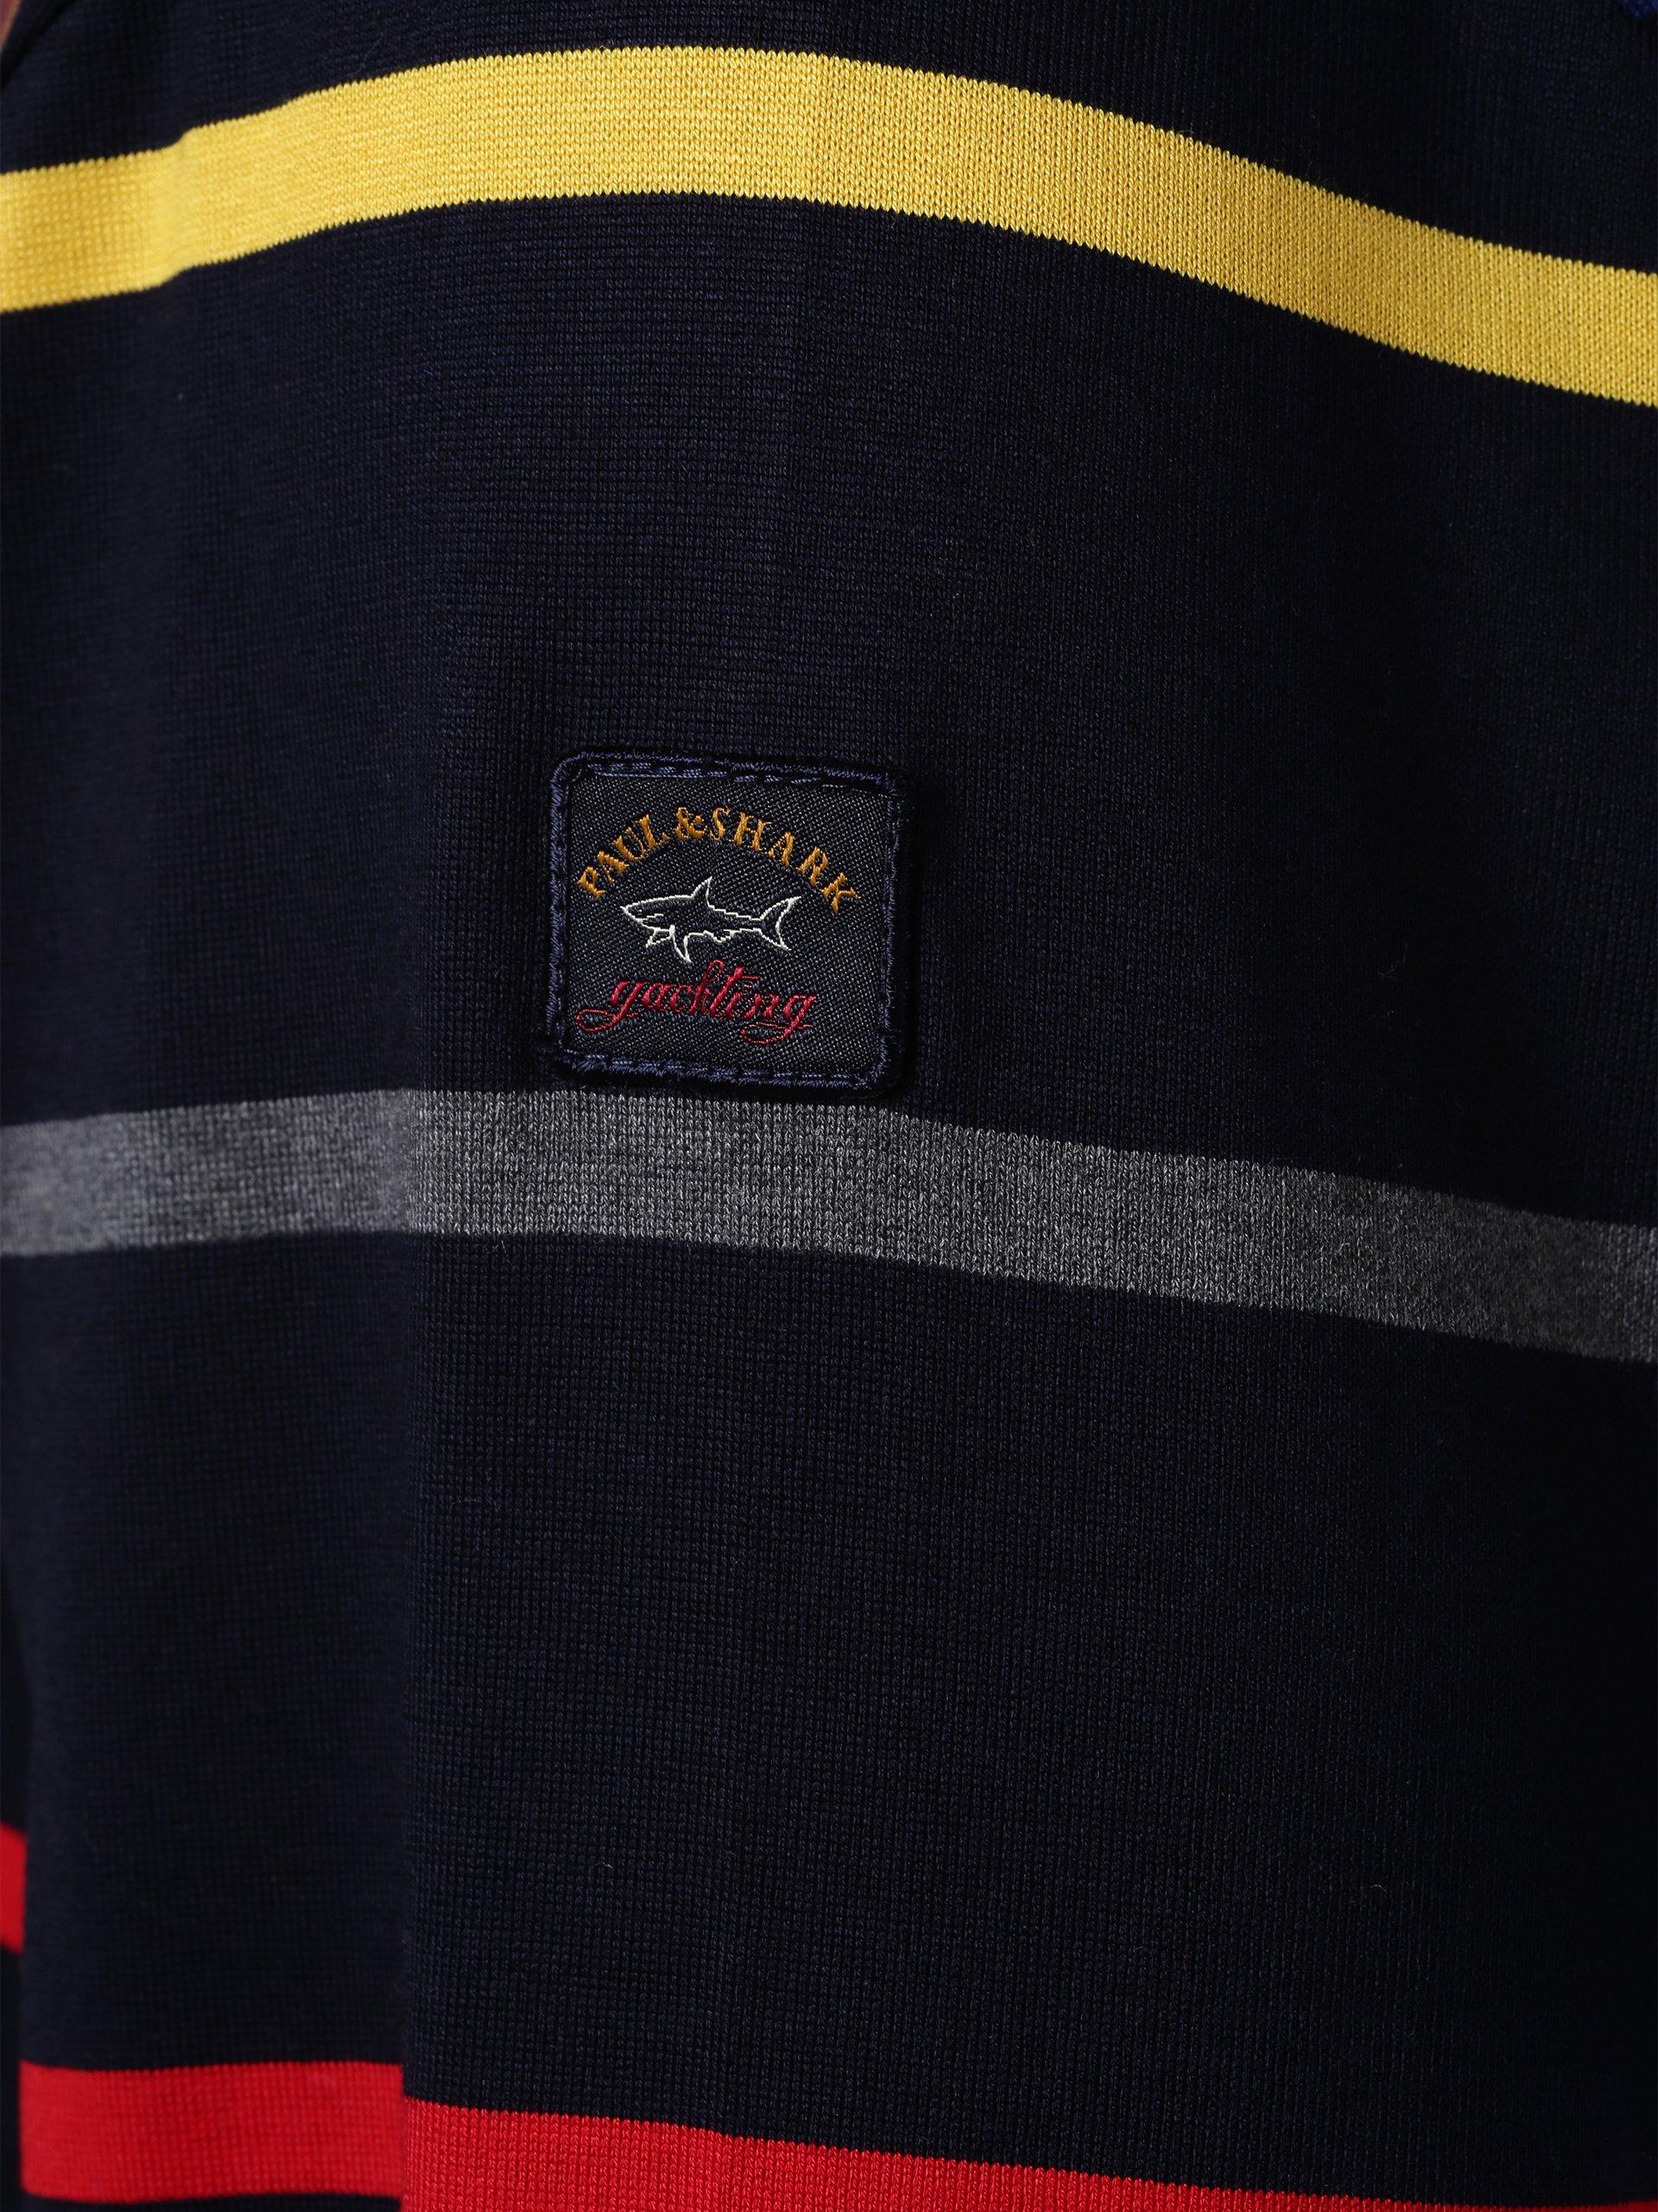 Paul & Shark Herren Poloshirt